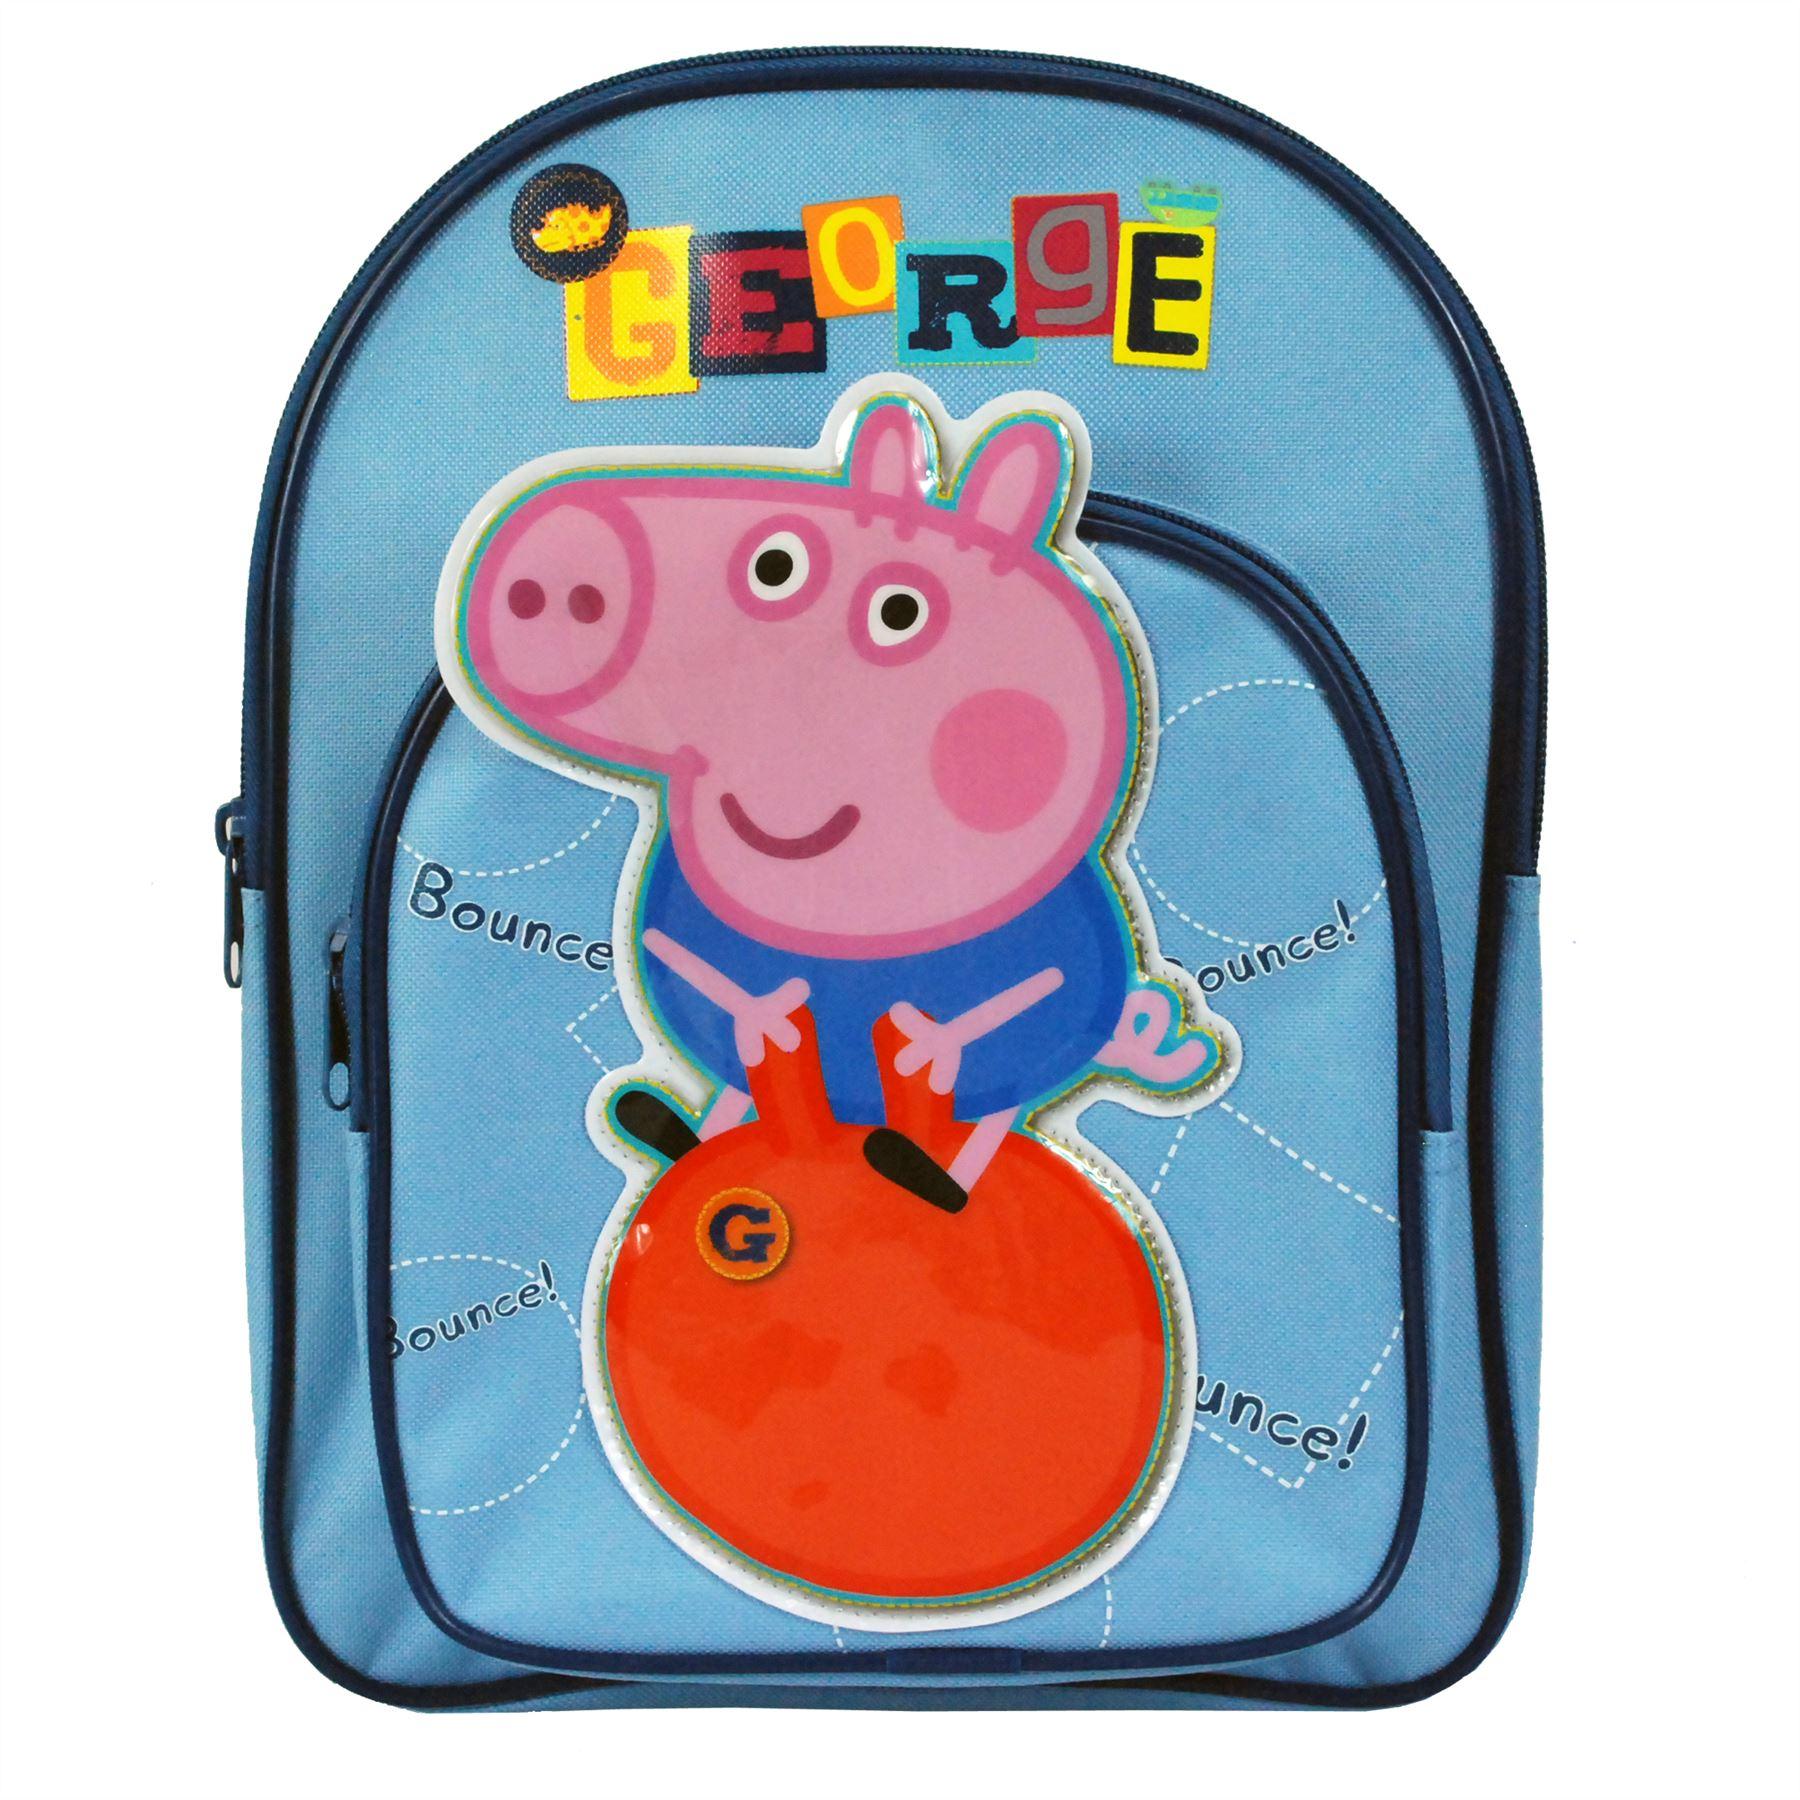 Peppa Pig Bounce George Boys Blue Kids Rucksack Travel Bag Childrens  Backpack e6b12cb5cb